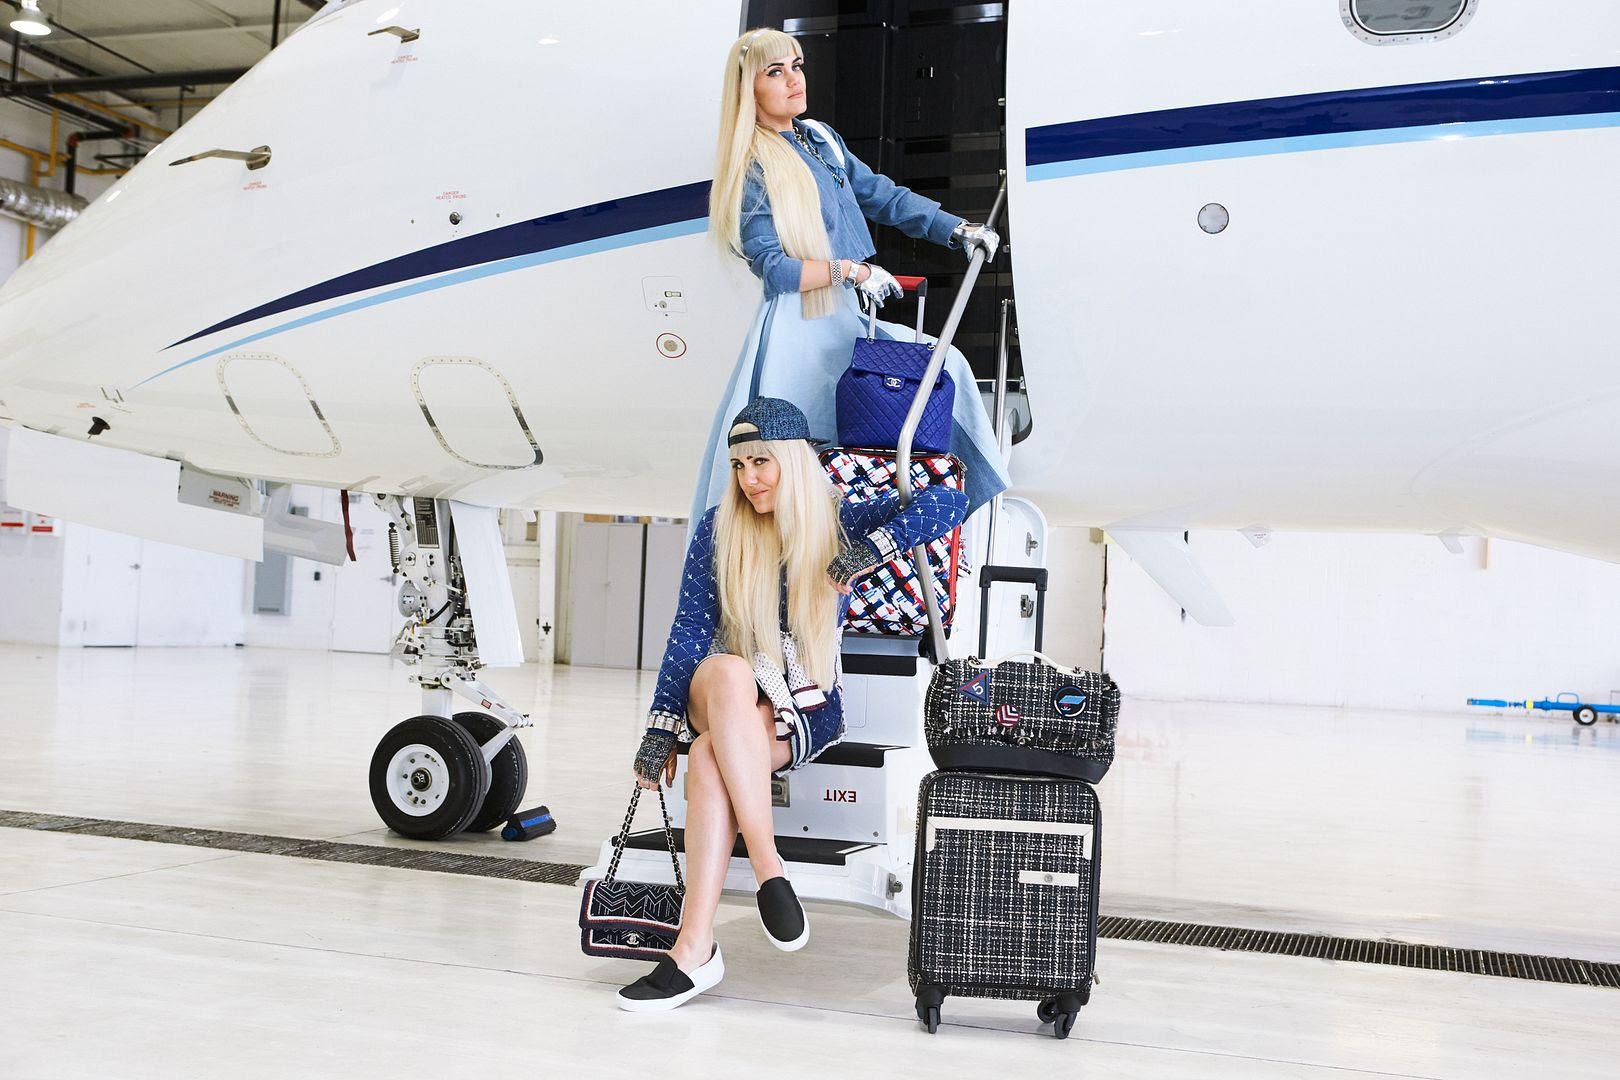 photo firstclass-jet-sisters-beckermanblog-chanelairlines-chanelluggage-photobyjaclynlocke-ninafarrautohairandmakeup-_zpstwjgfaz3.jpg